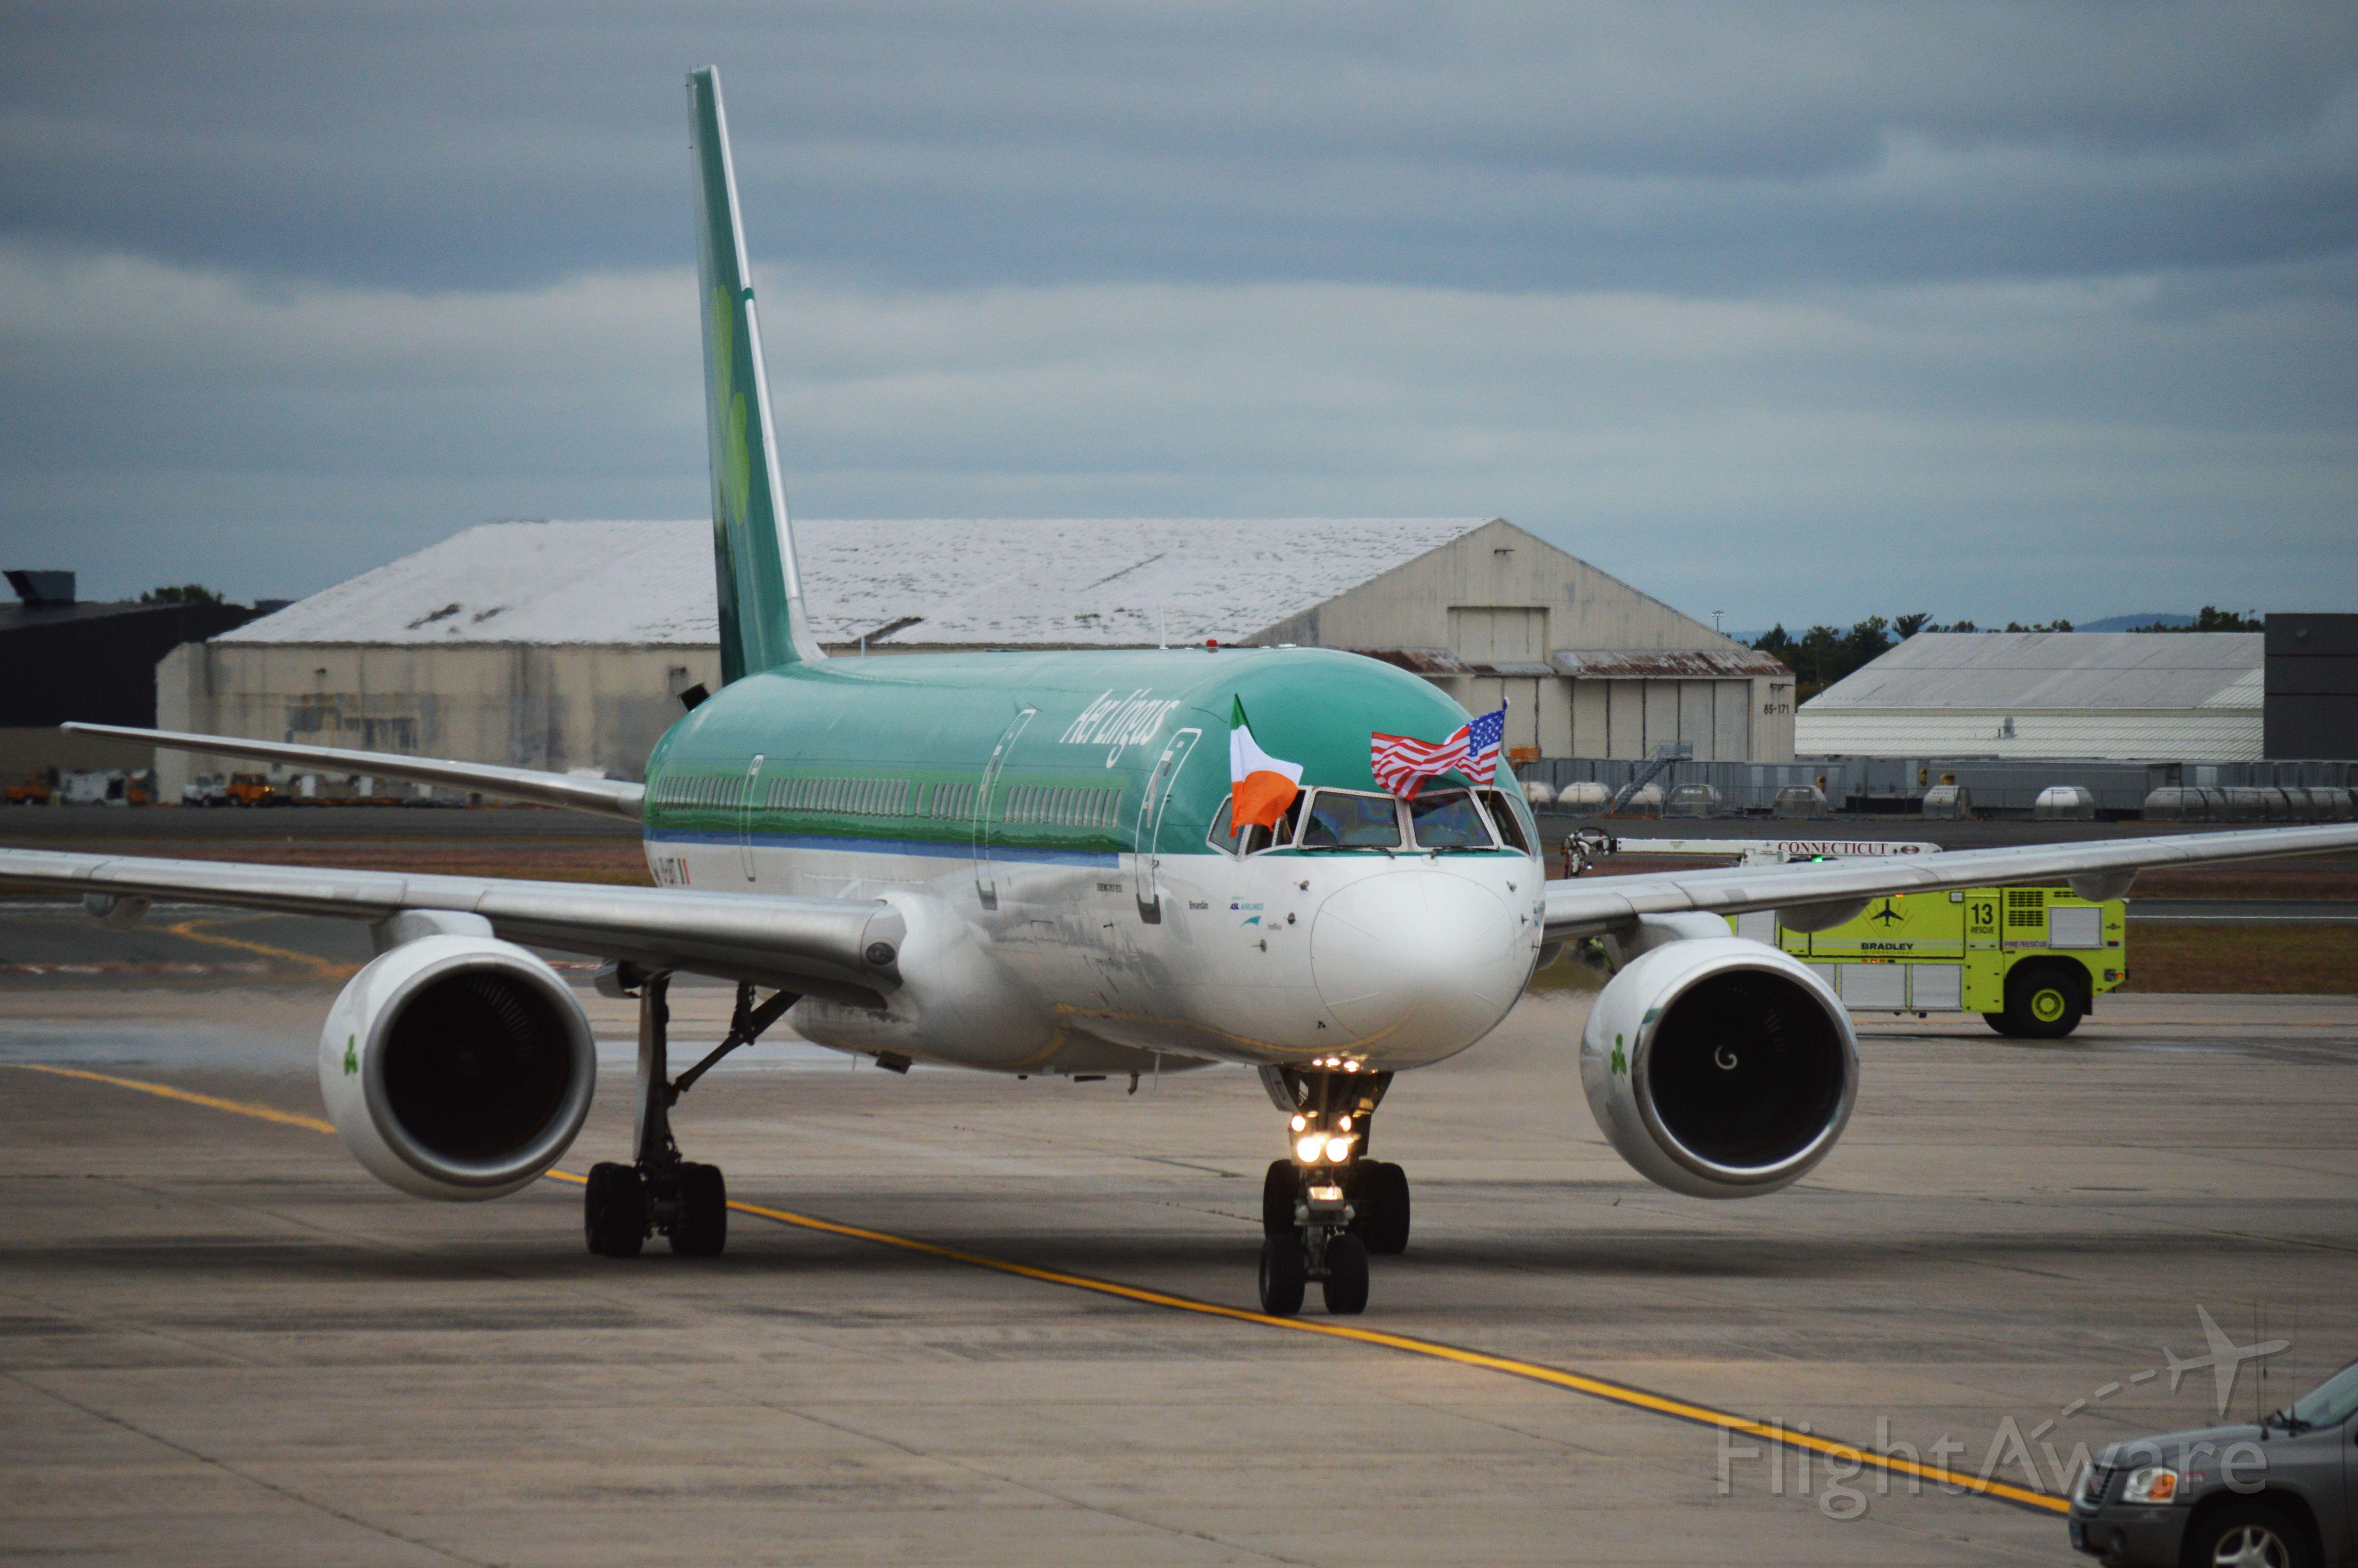 Boeing 757-200 (EI-LBT) - Welcome to Bradley, Aer Lingus!